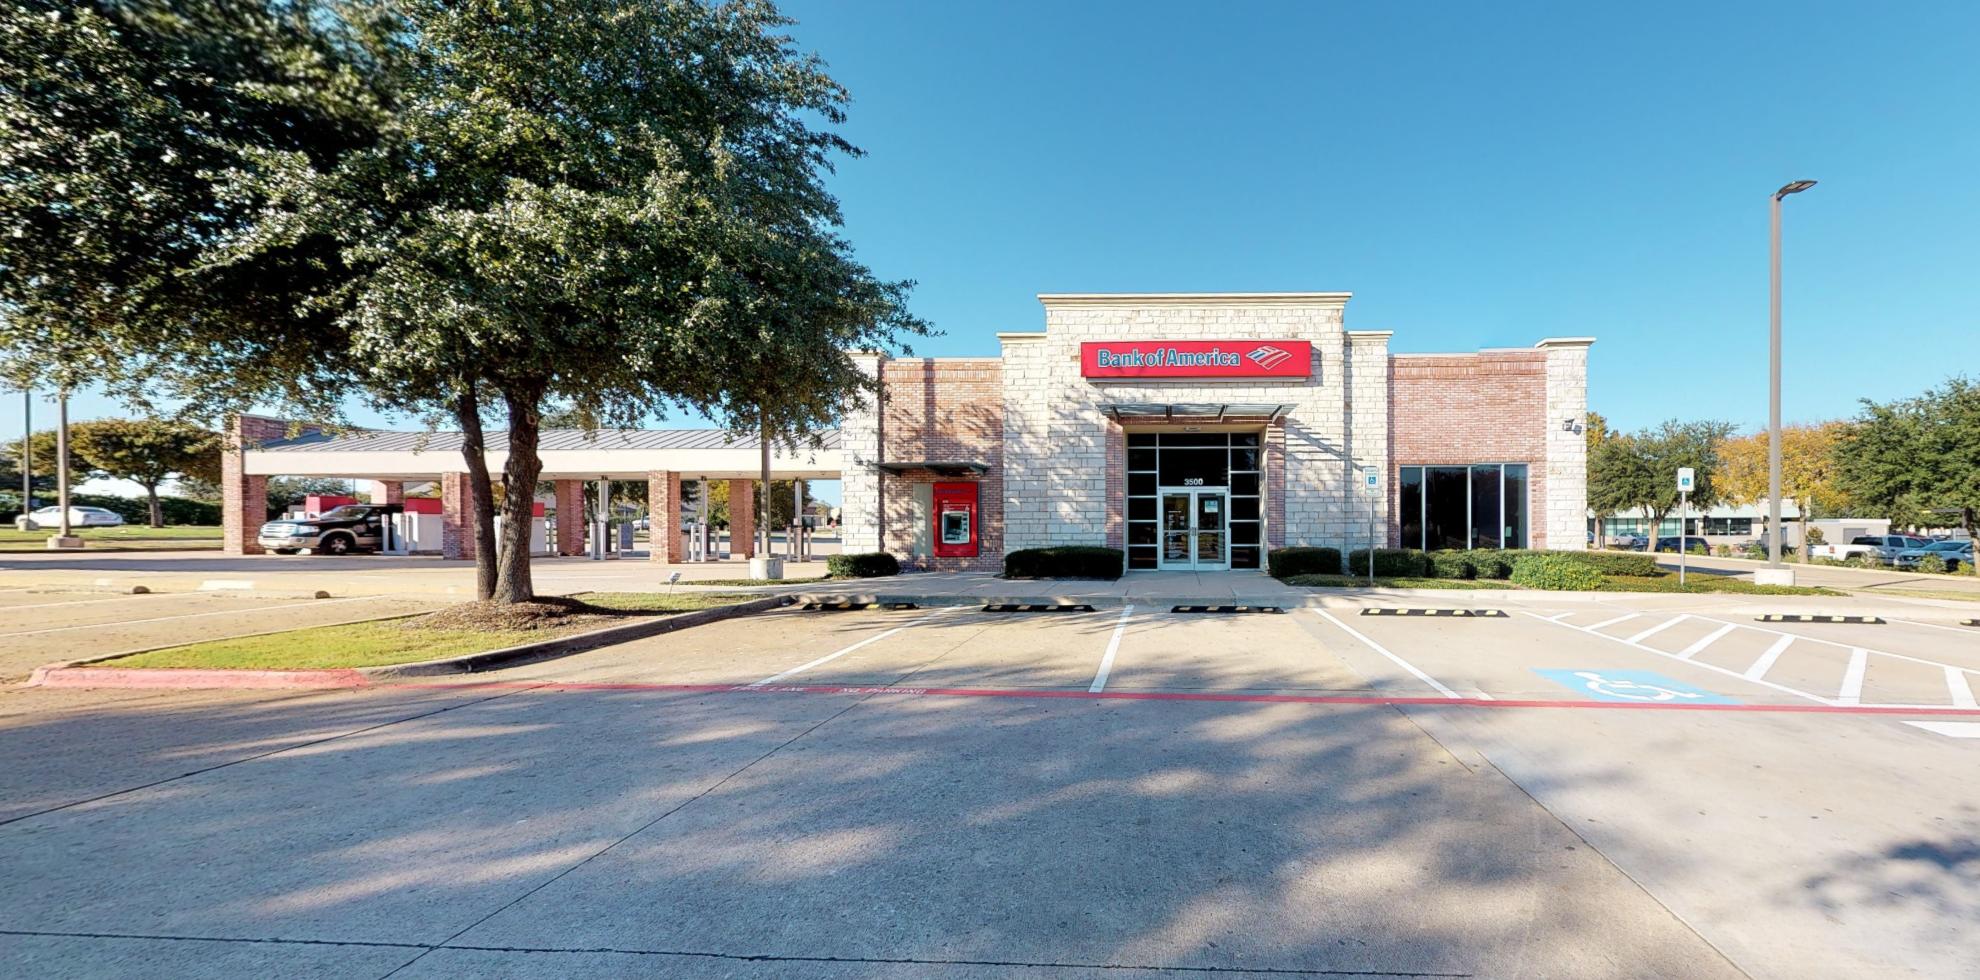 Bank of America financial center with drive-thru ATM | 3500 Eldorado Pkwy, McKinney, TX 75070